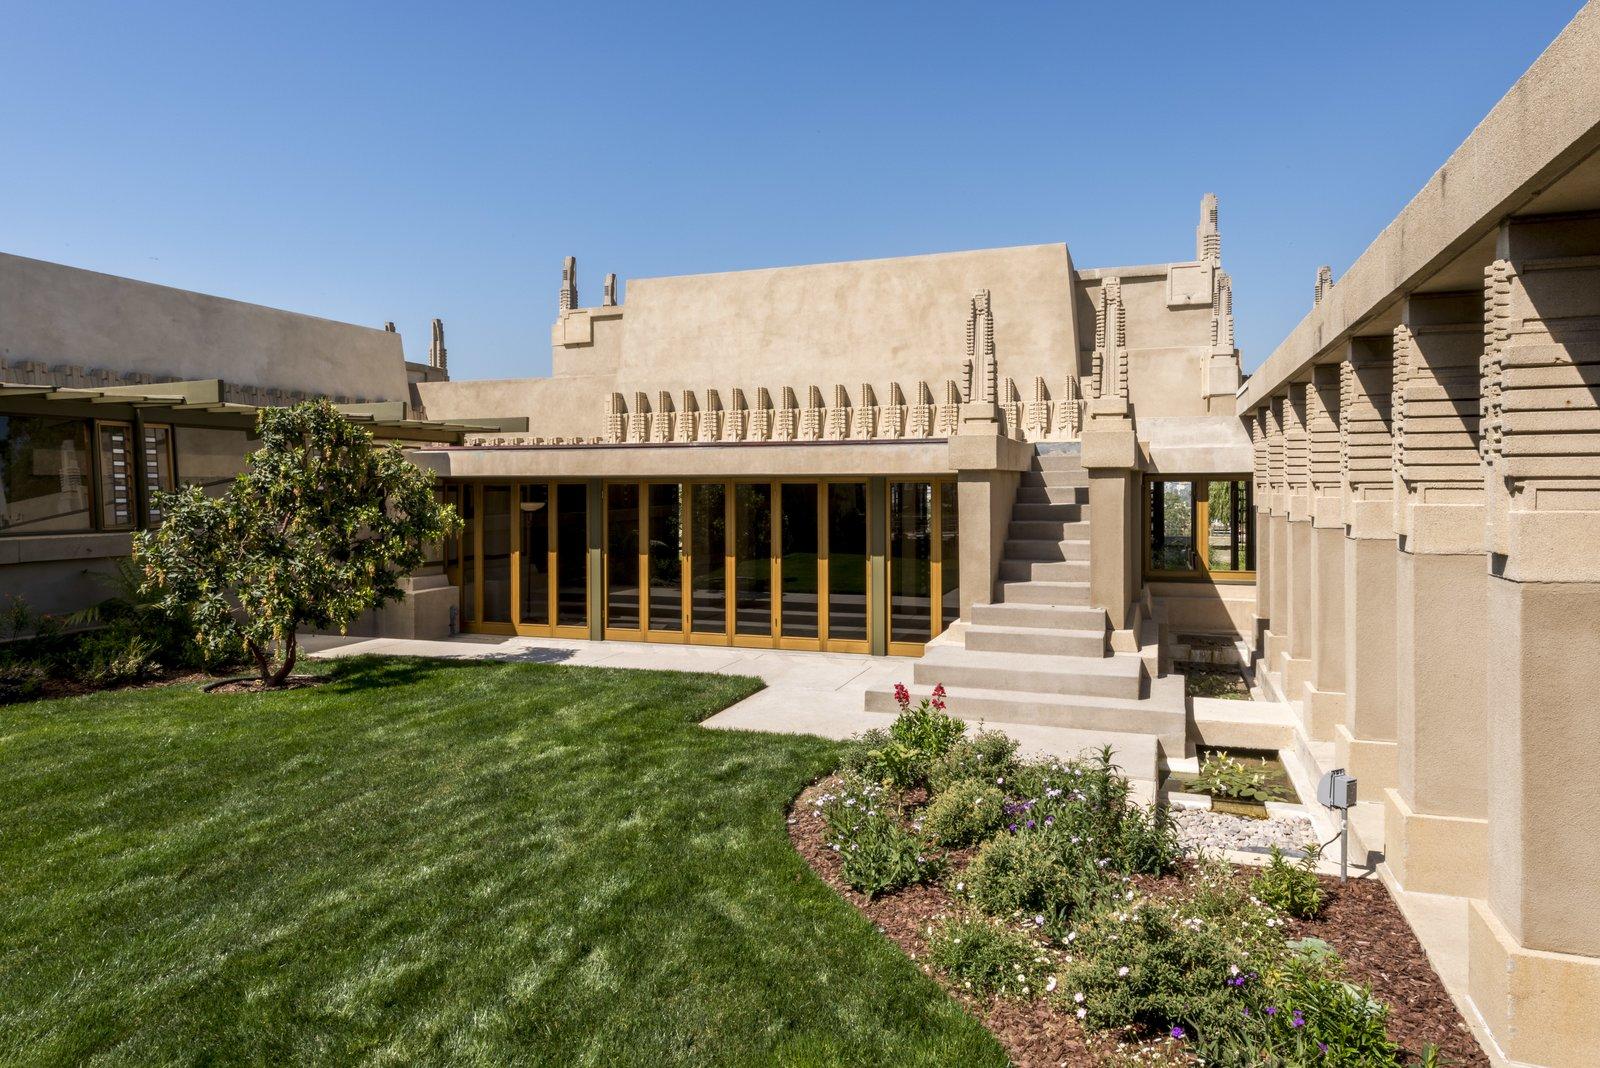 Hollyhock House in Los Angeles, California